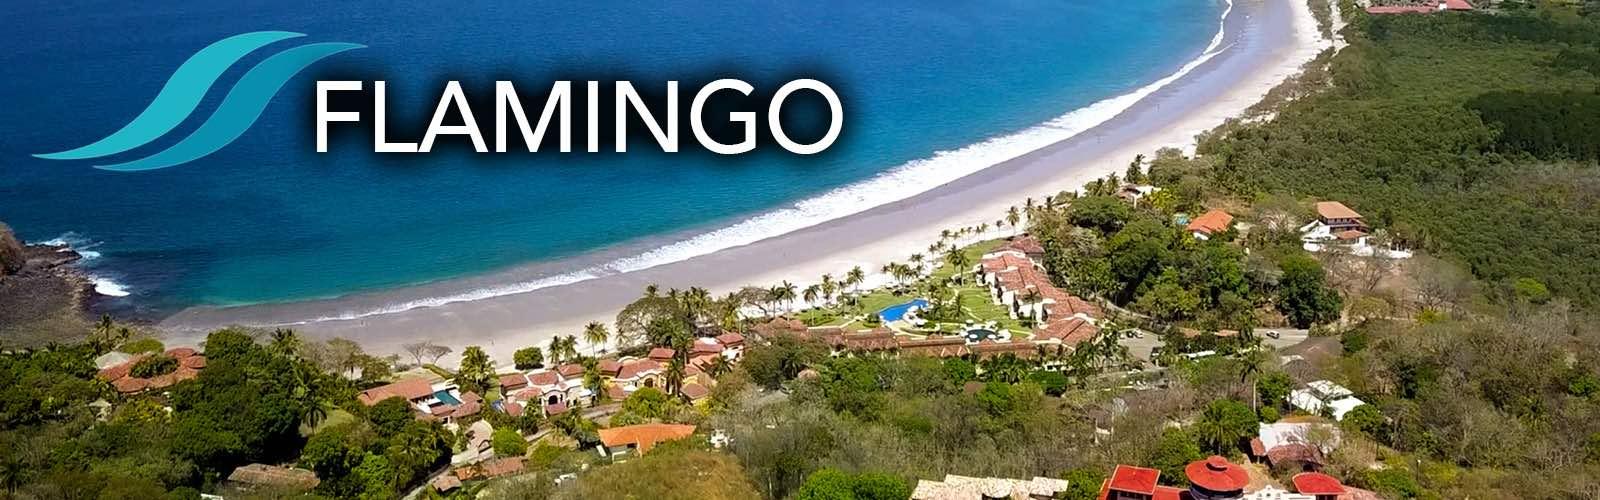 Playa Flamingo on the Gold Coast of Guanacaste in Costa Rica